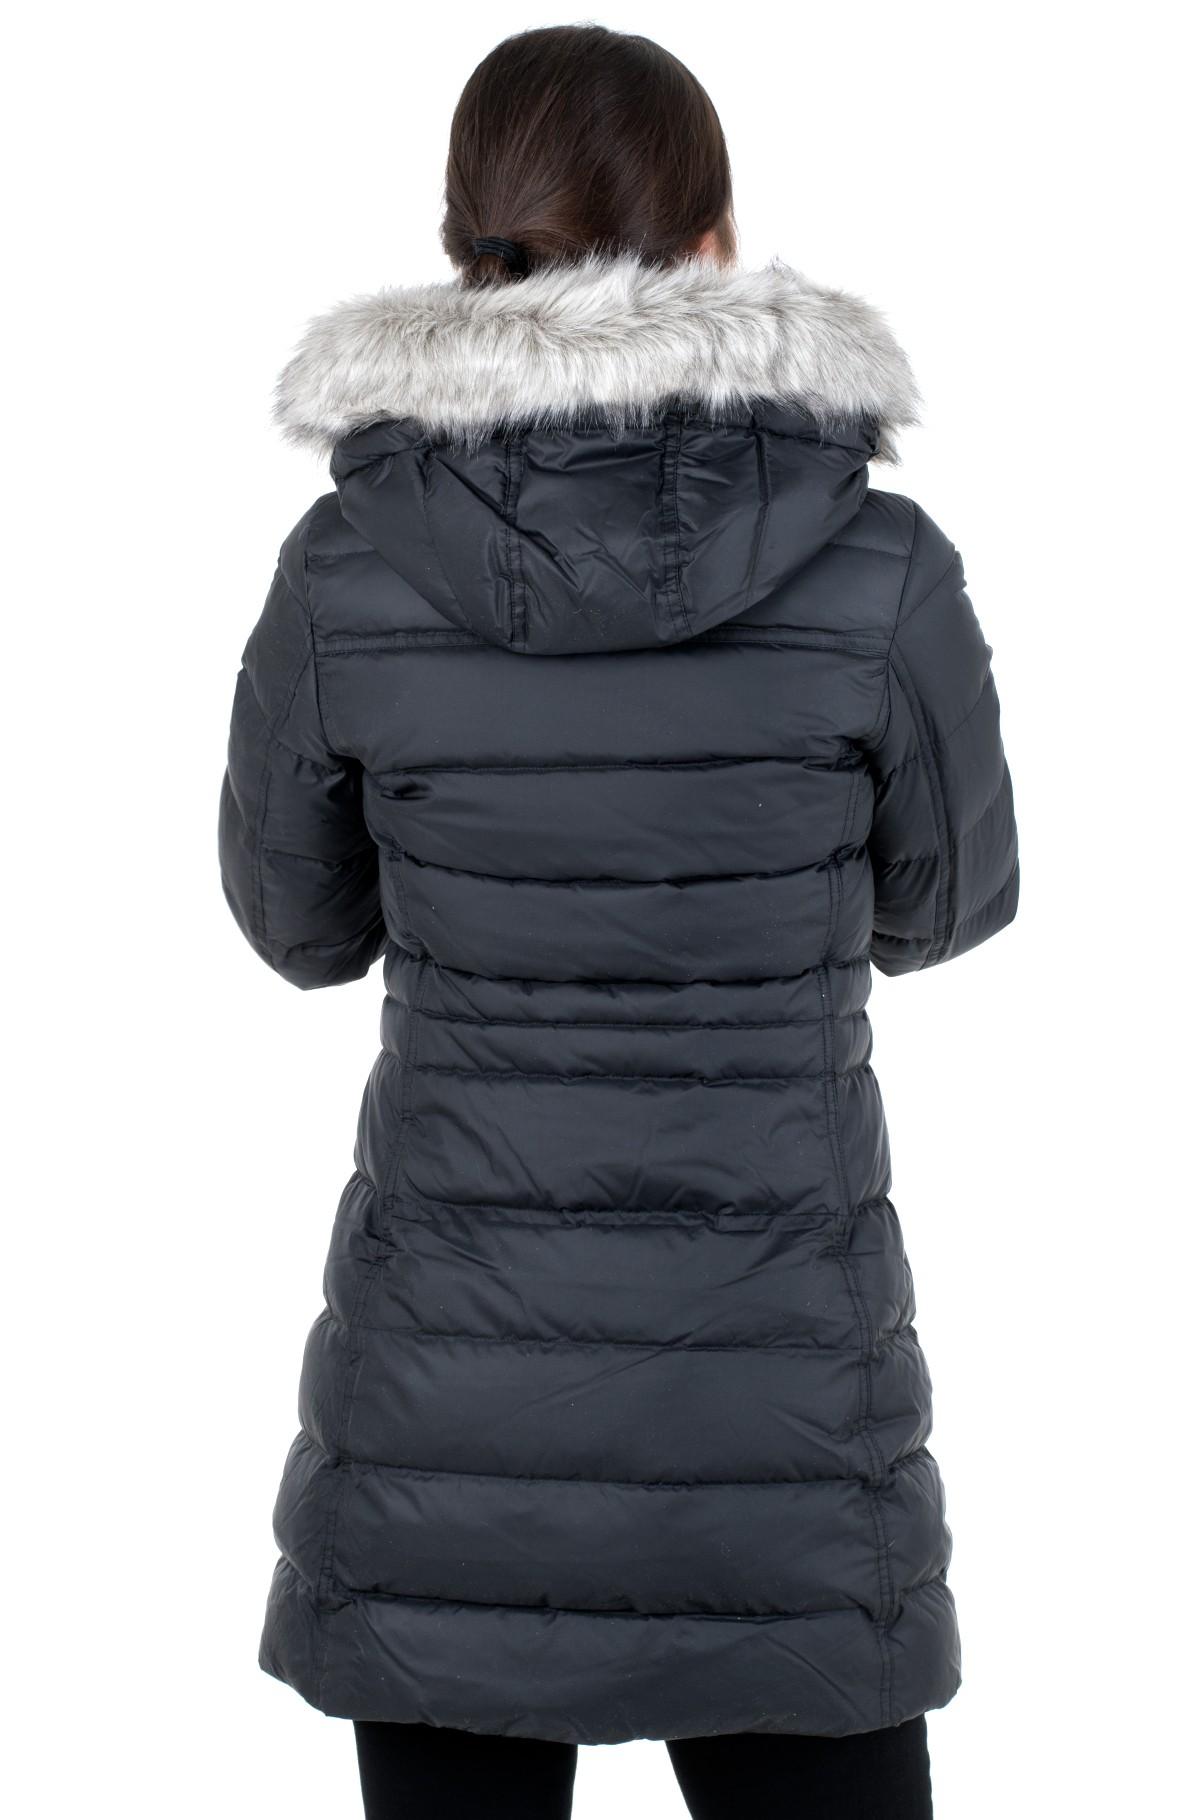 Pea coat NEW TYRA DOWN COAT-full-3